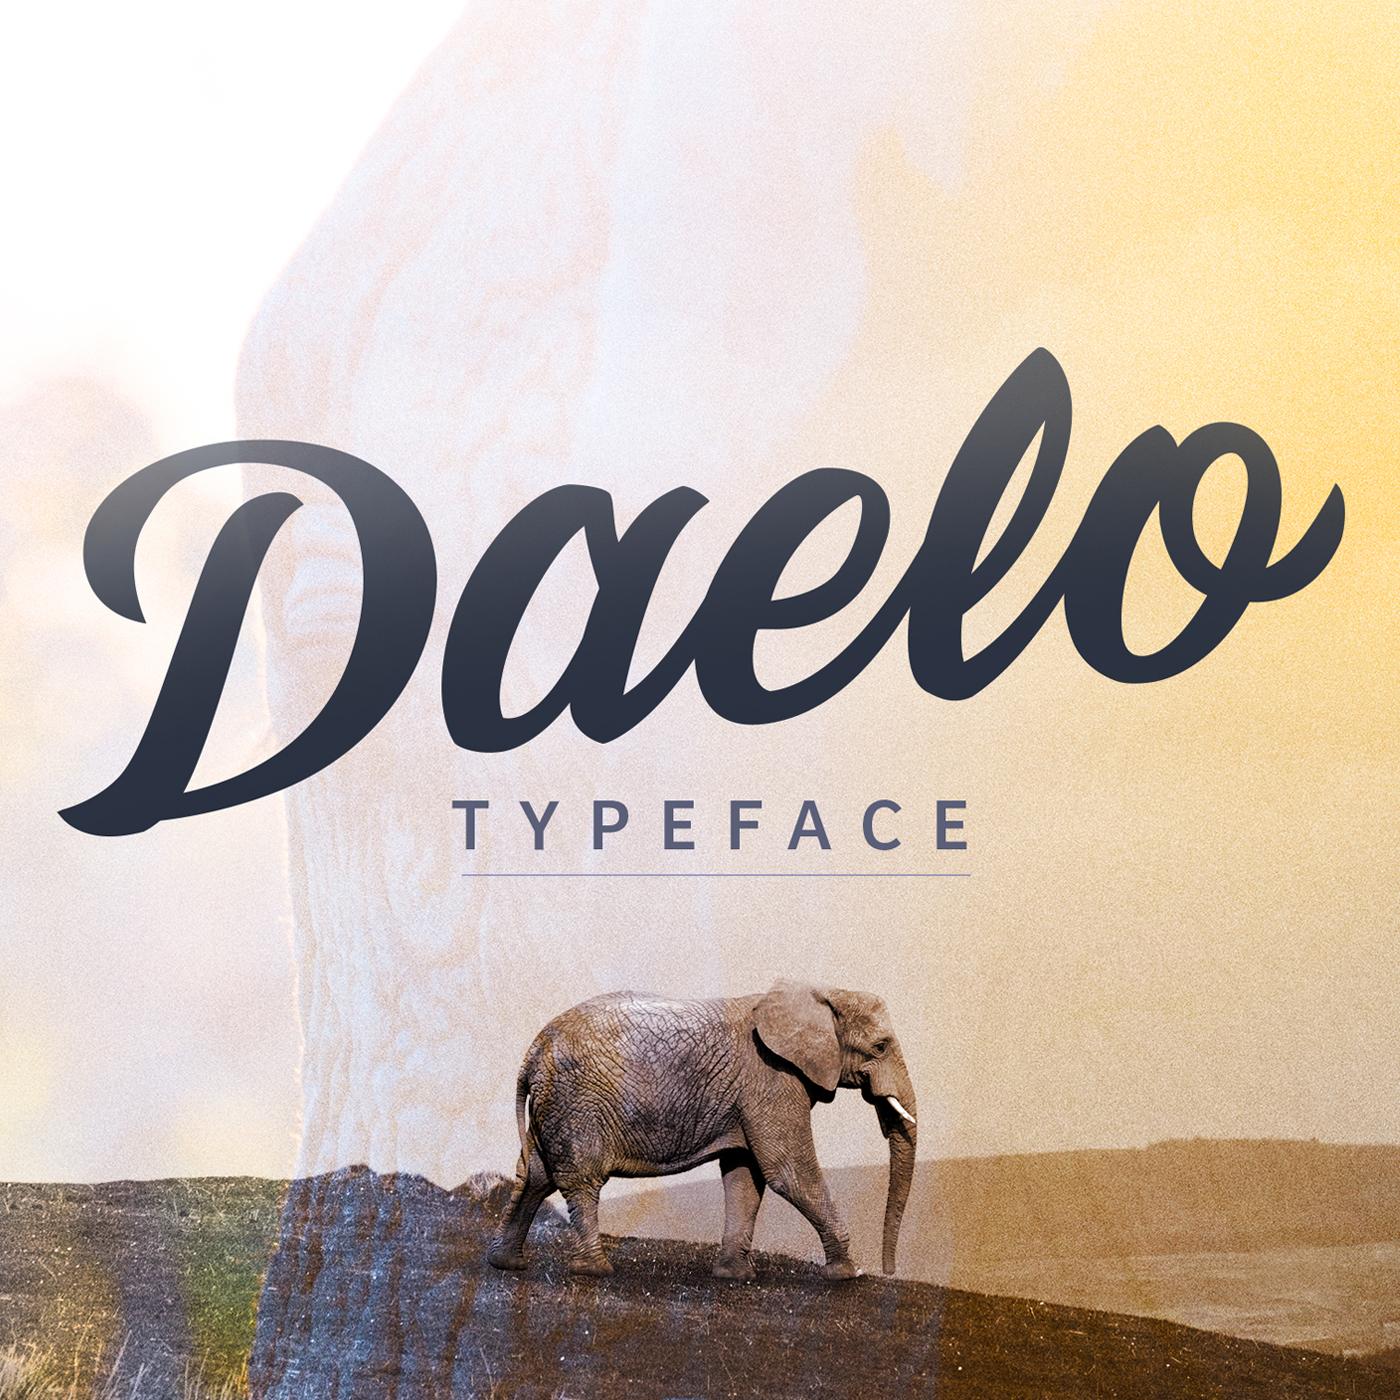 Daelo-Typeface_link-creative